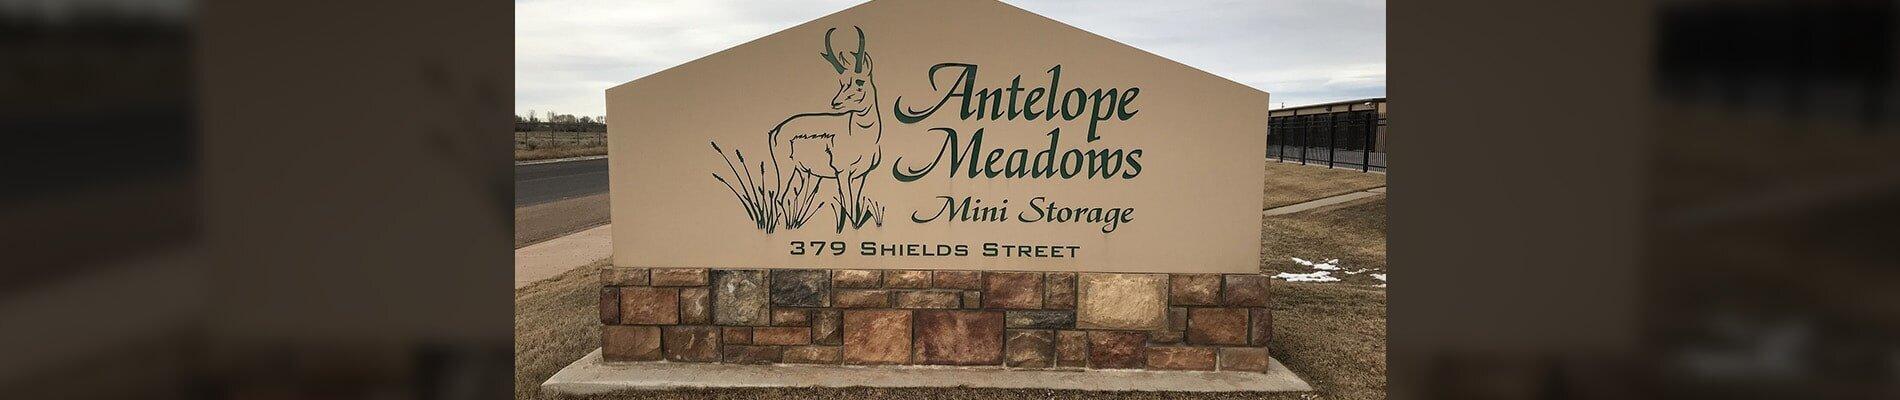 antelope meadows mini storage office